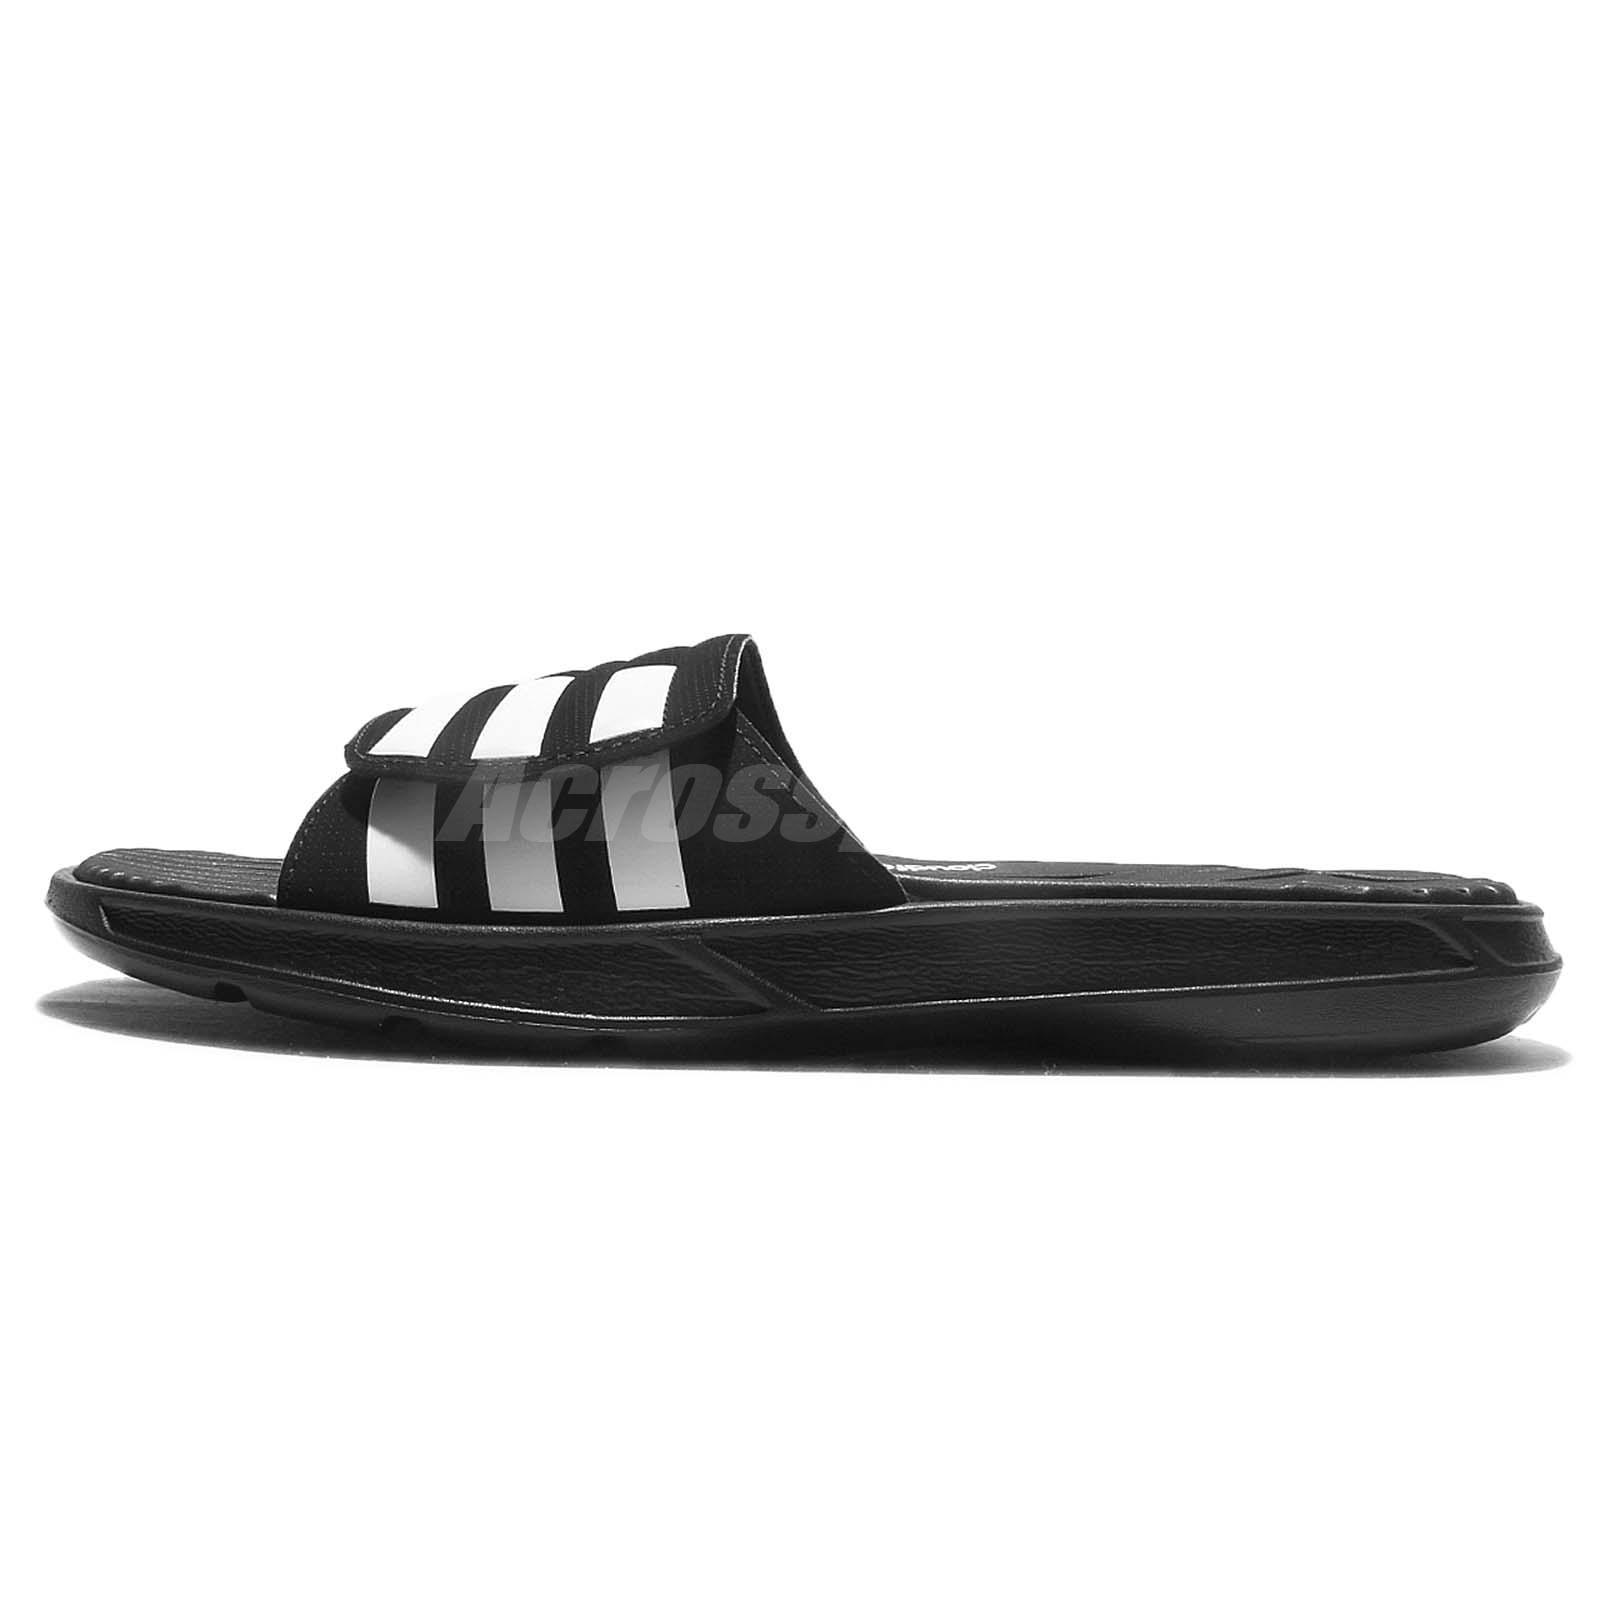 49e1494098f1 Details about 2018 adidas Izamo CF Black White Men Sandal Slides Slippers  S77989